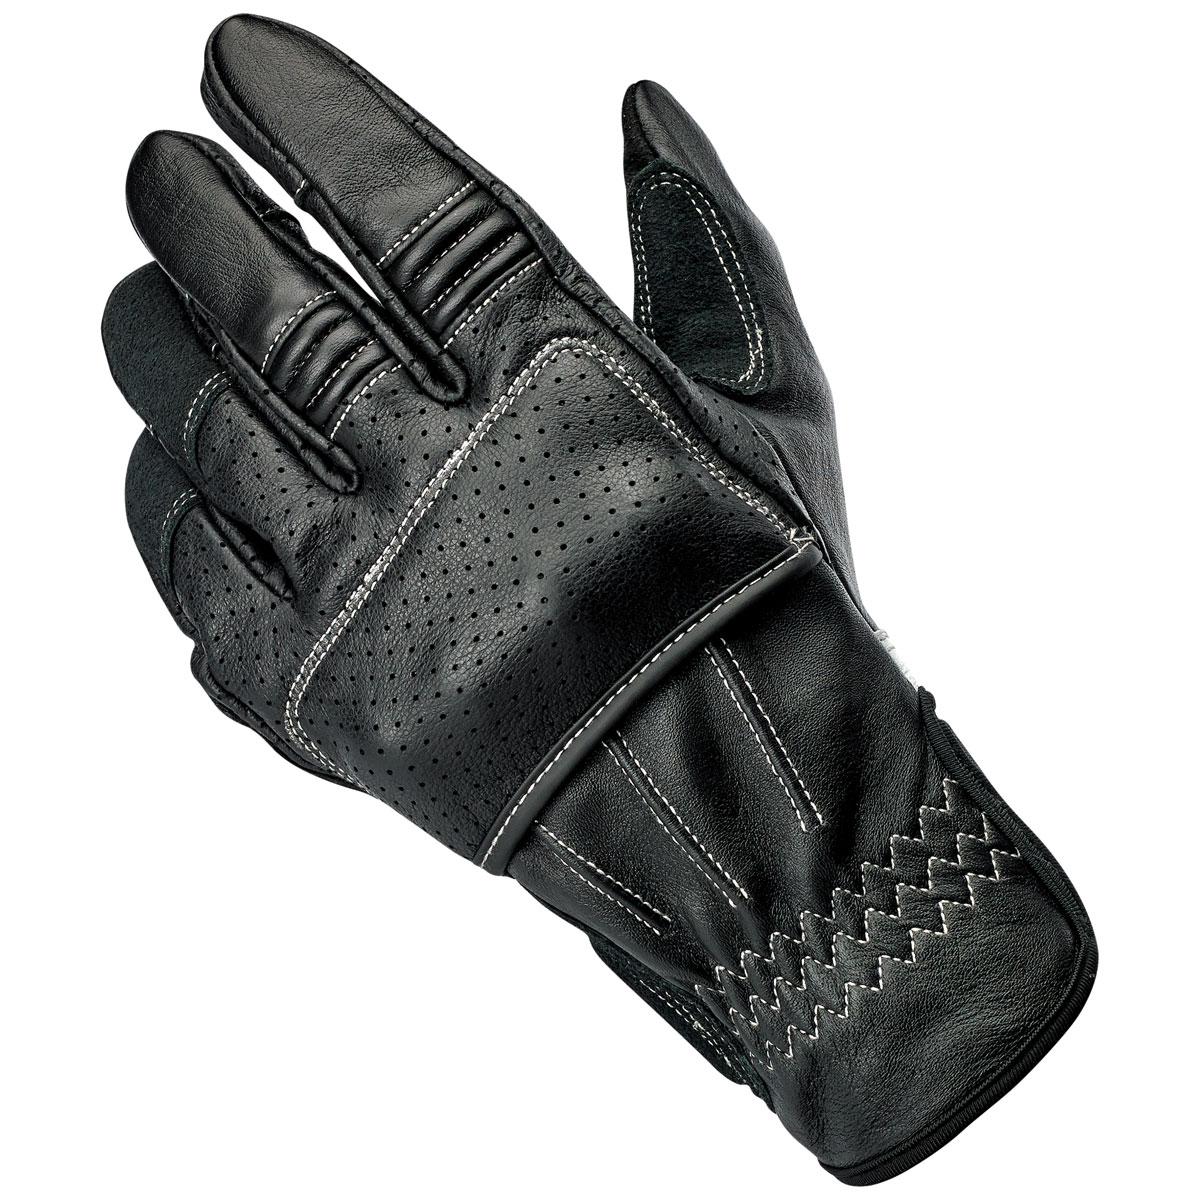 Biltwell Inc. Men's Borrego Black/Cement Leather Gloves